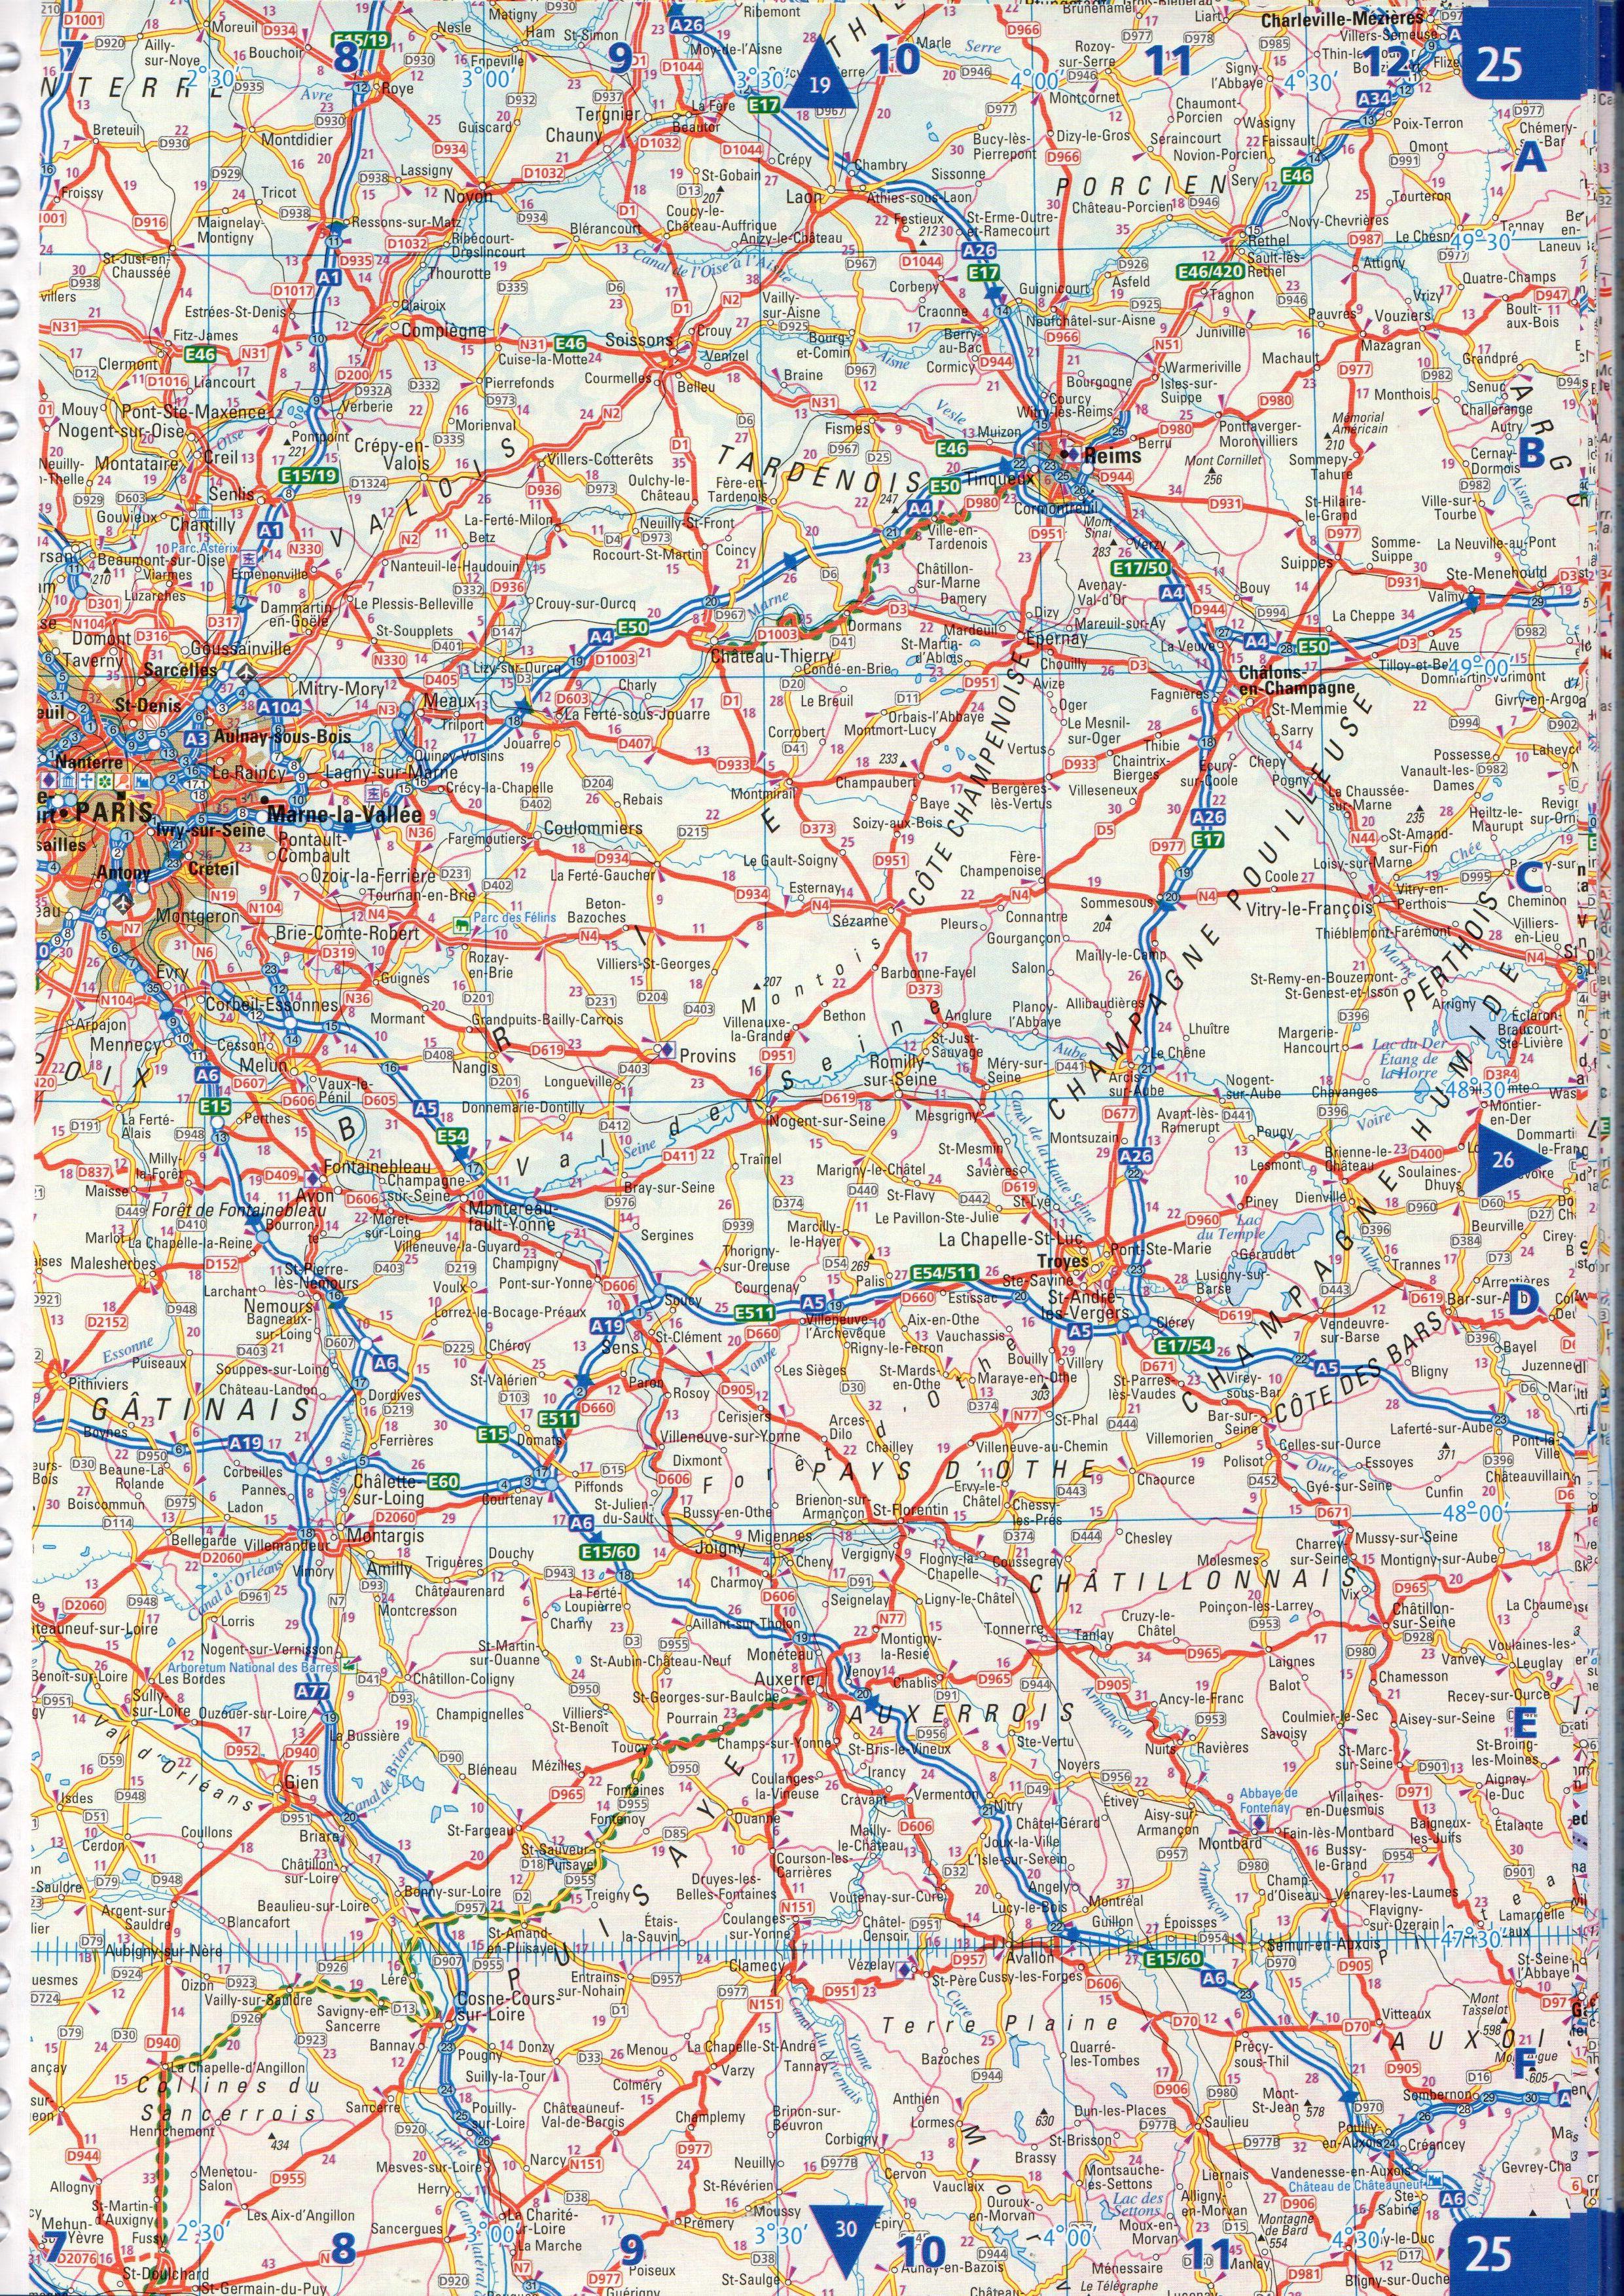 Collins Európa atlasz: mintaoldal